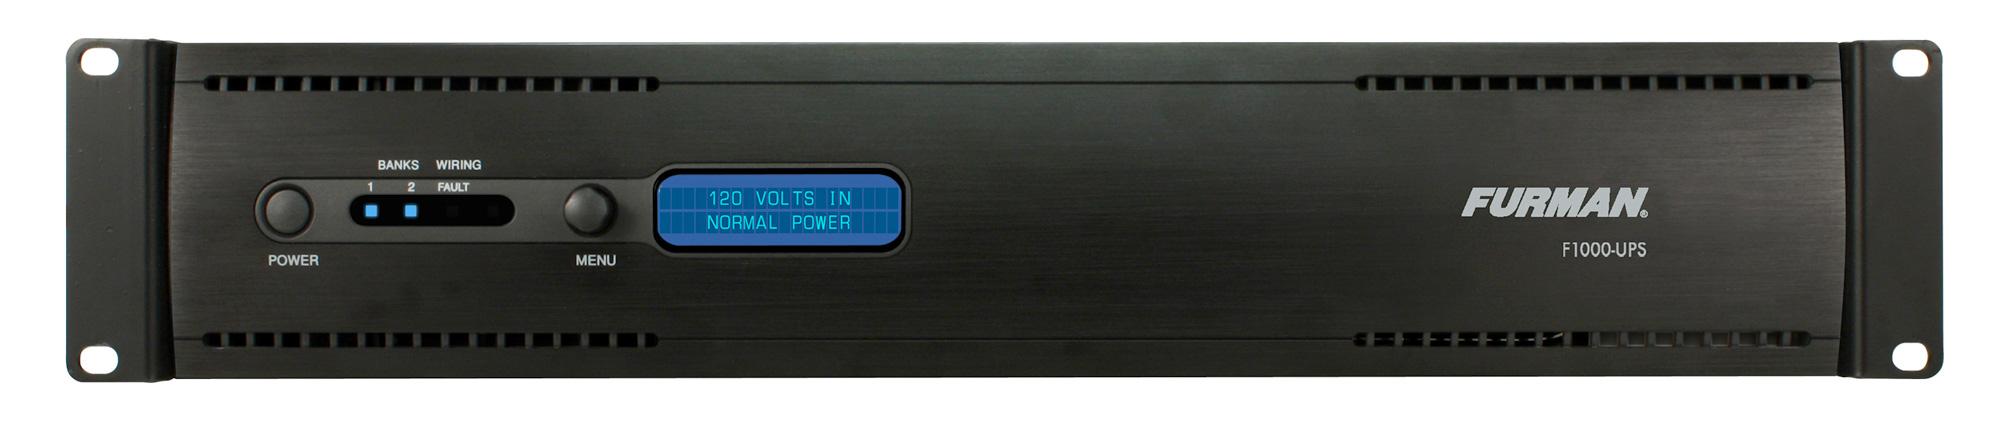 Ups Power Conditioner : furman f1000 ups uninterruptible power supply battery backup power conditioner ~ Vivirlamusica.com Haus und Dekorationen